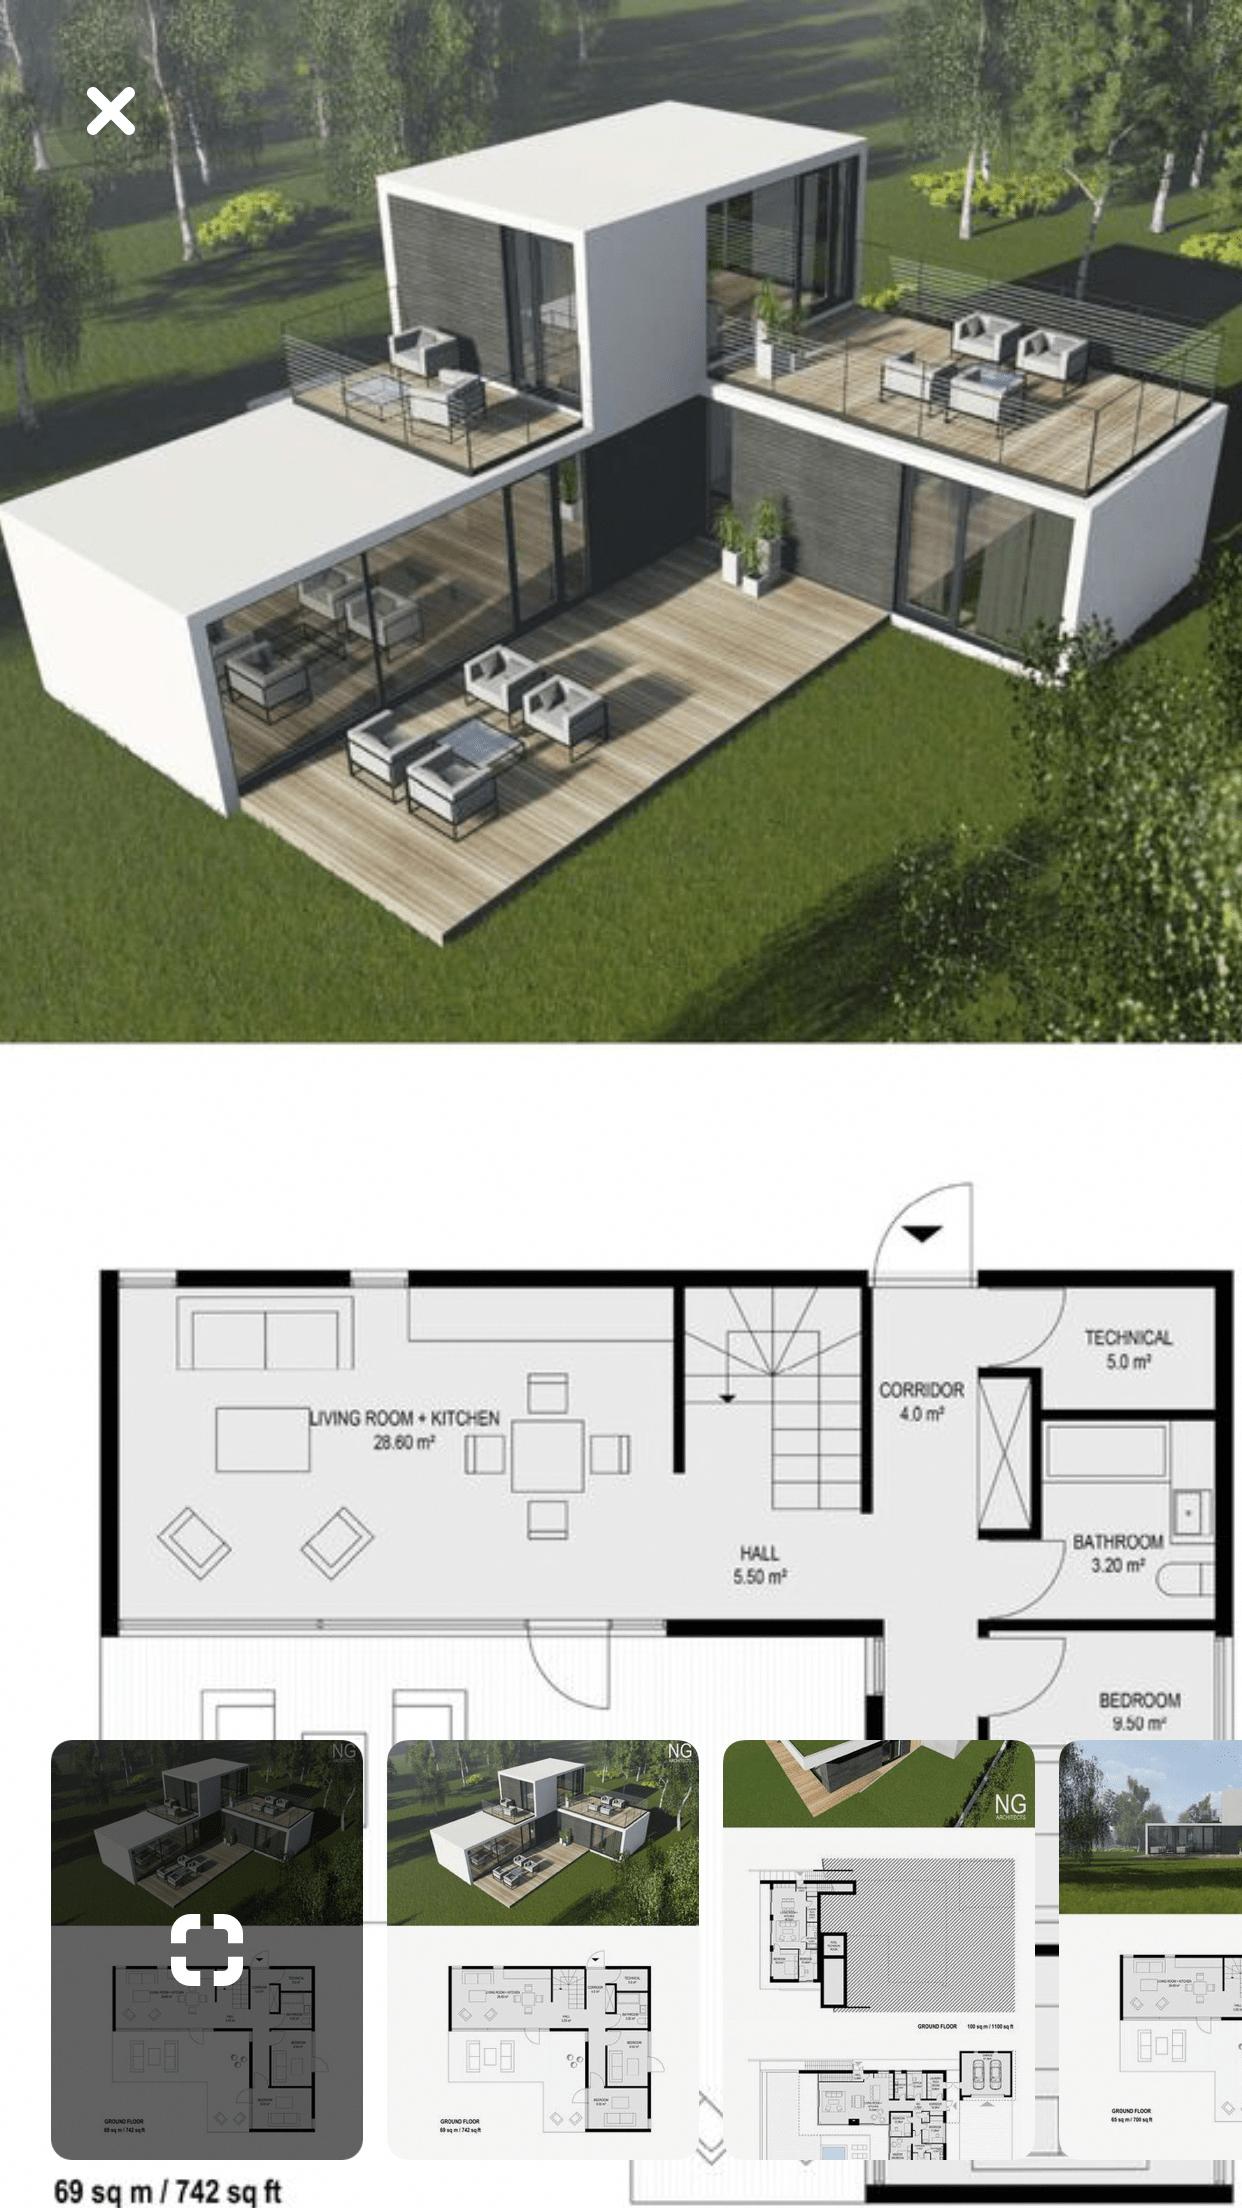 101 Super moderne Versandbehälter Häuser Ideen, Geschäft, Garage, Werkstatt, …